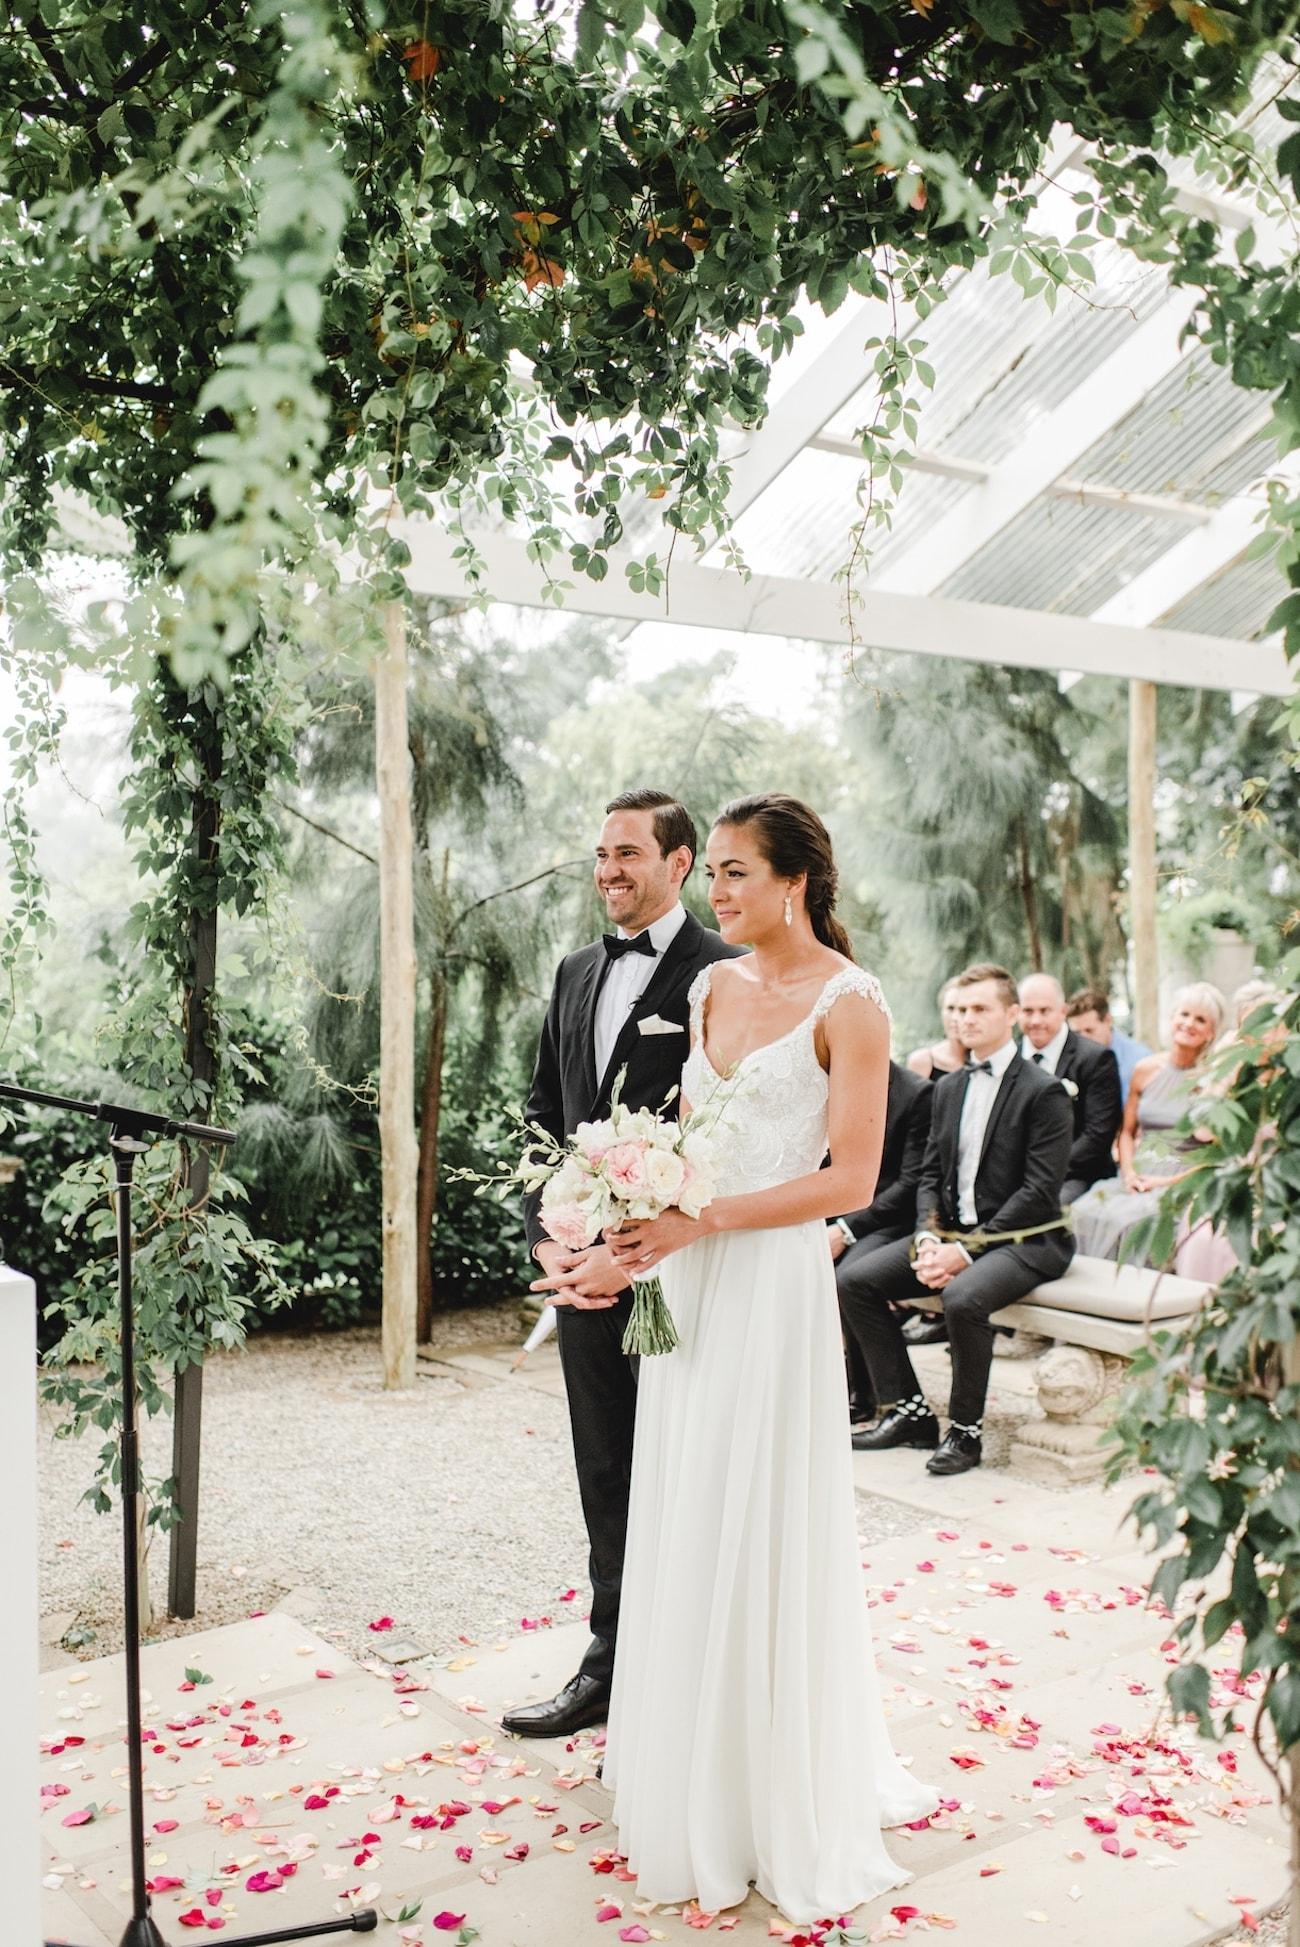 Wedding Ceremony at White Light   Image: Carla Adel